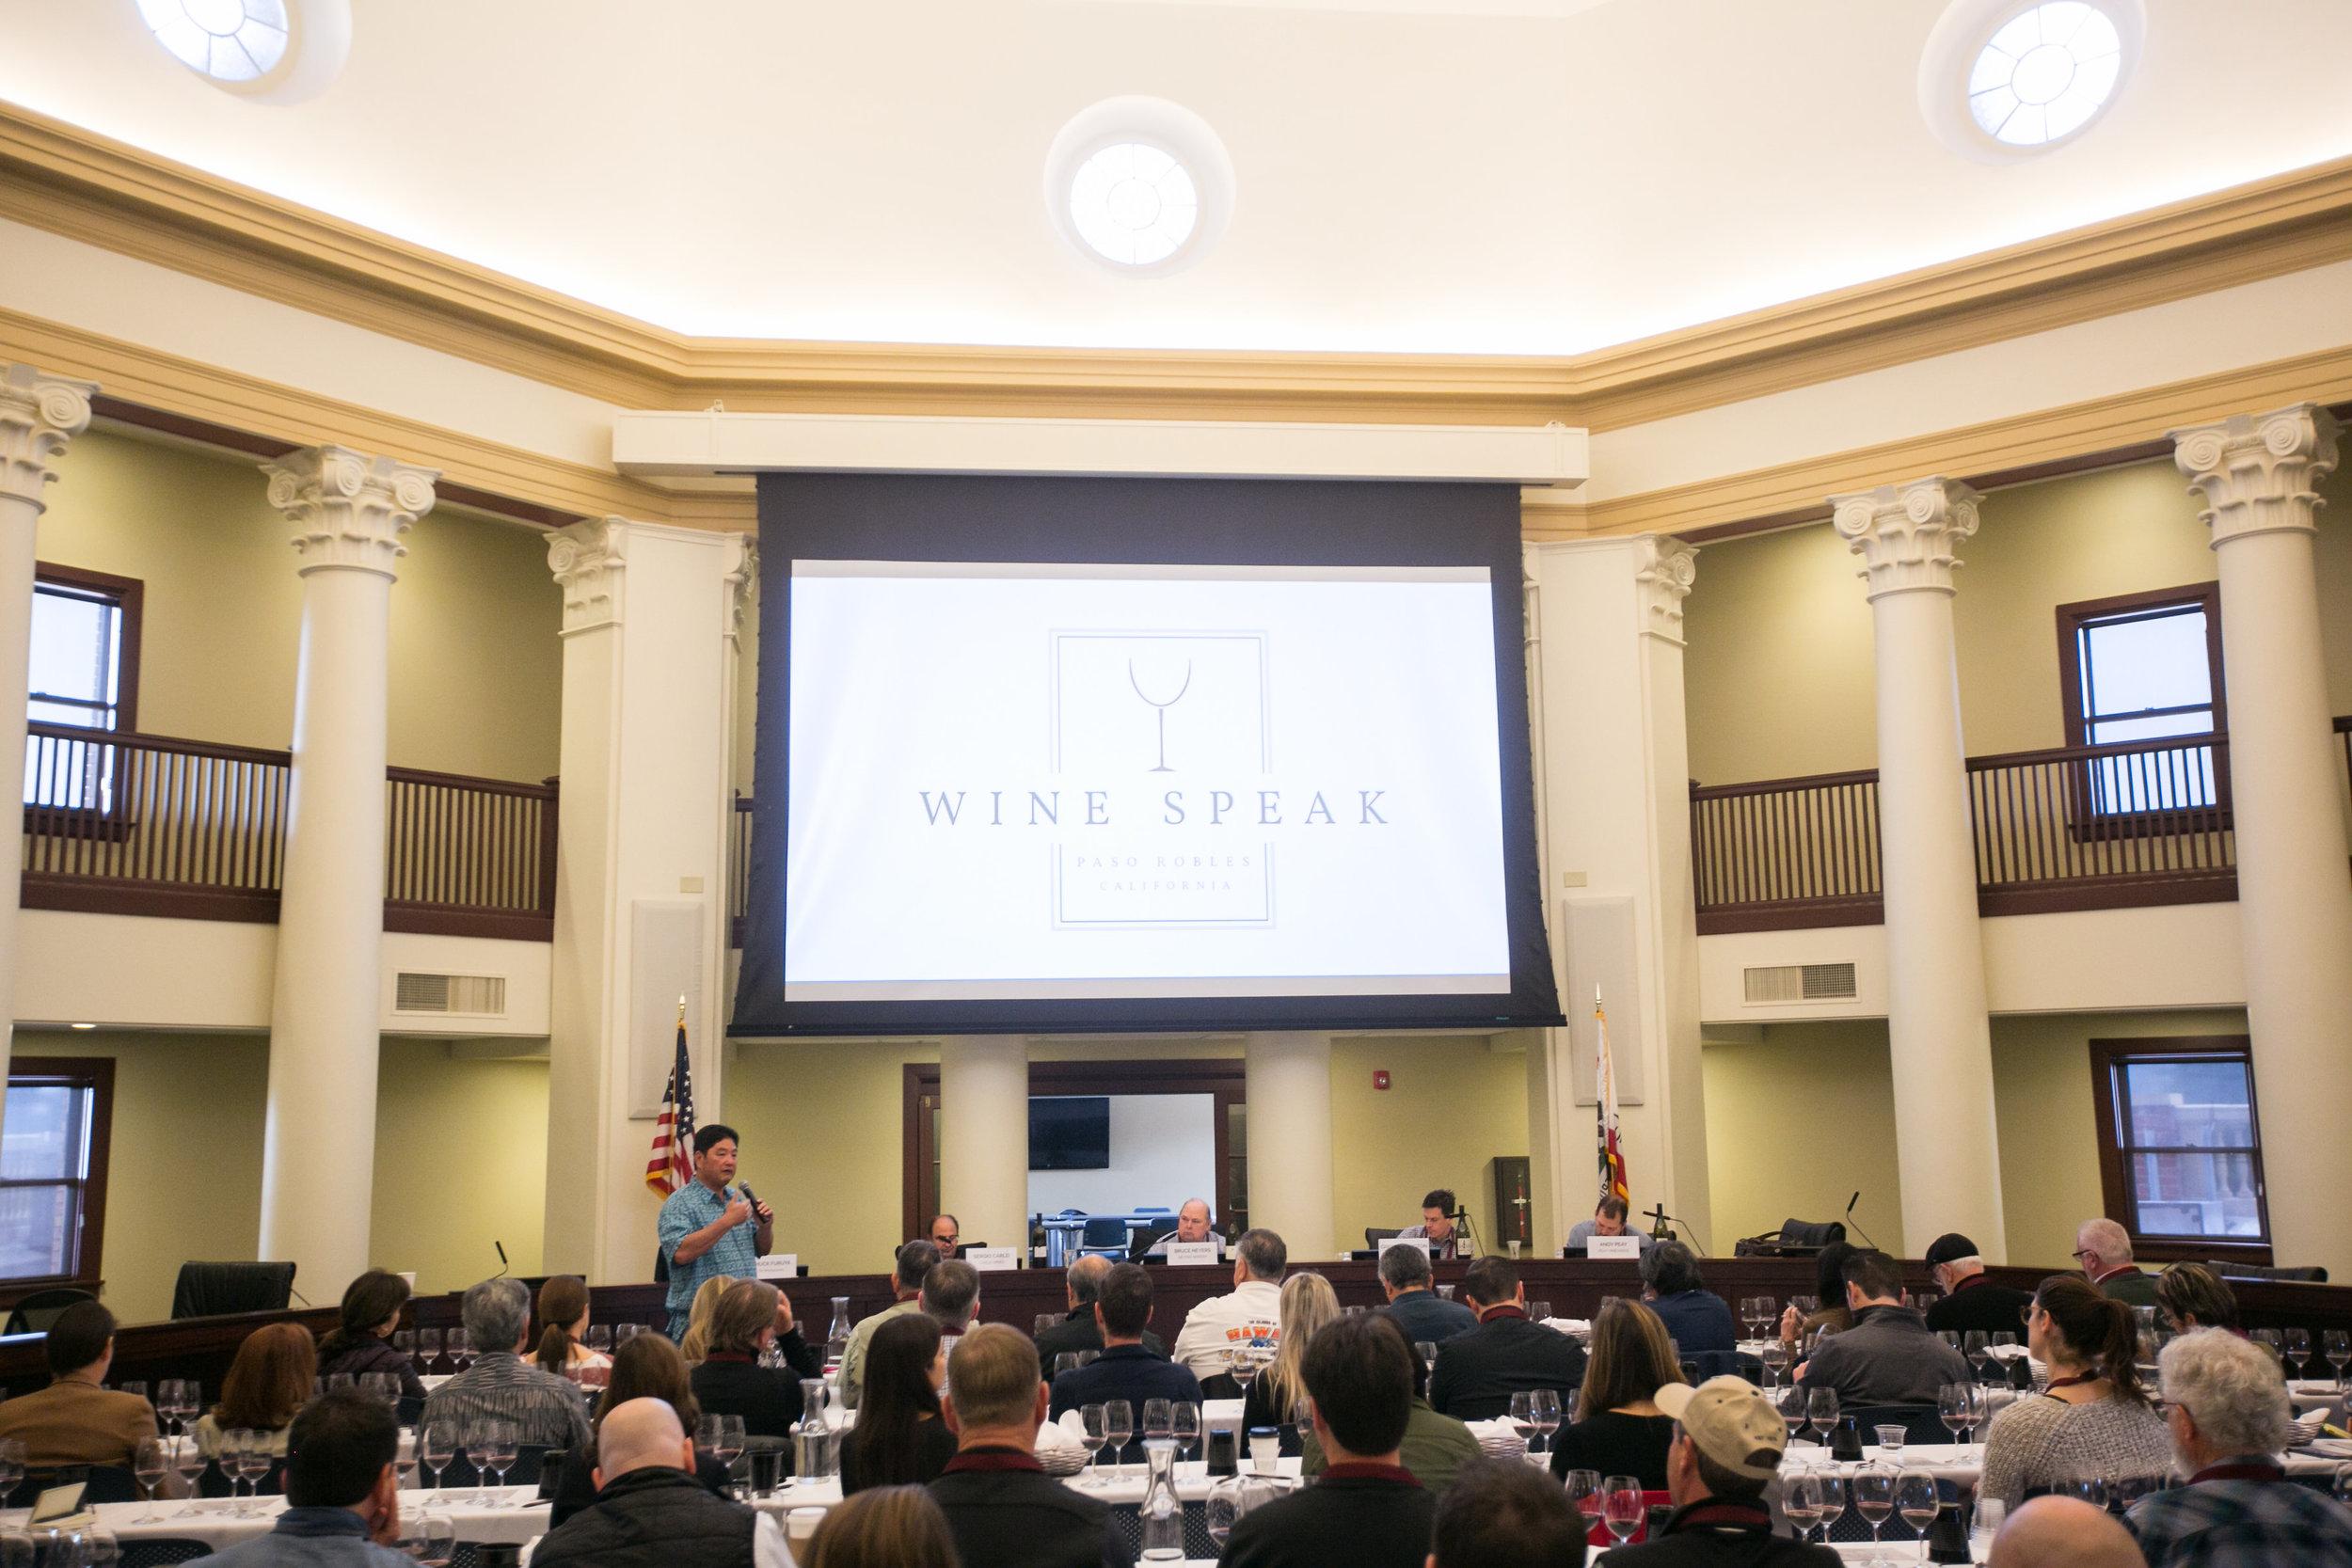 acacia-productions_wine-speak-0125.jpg